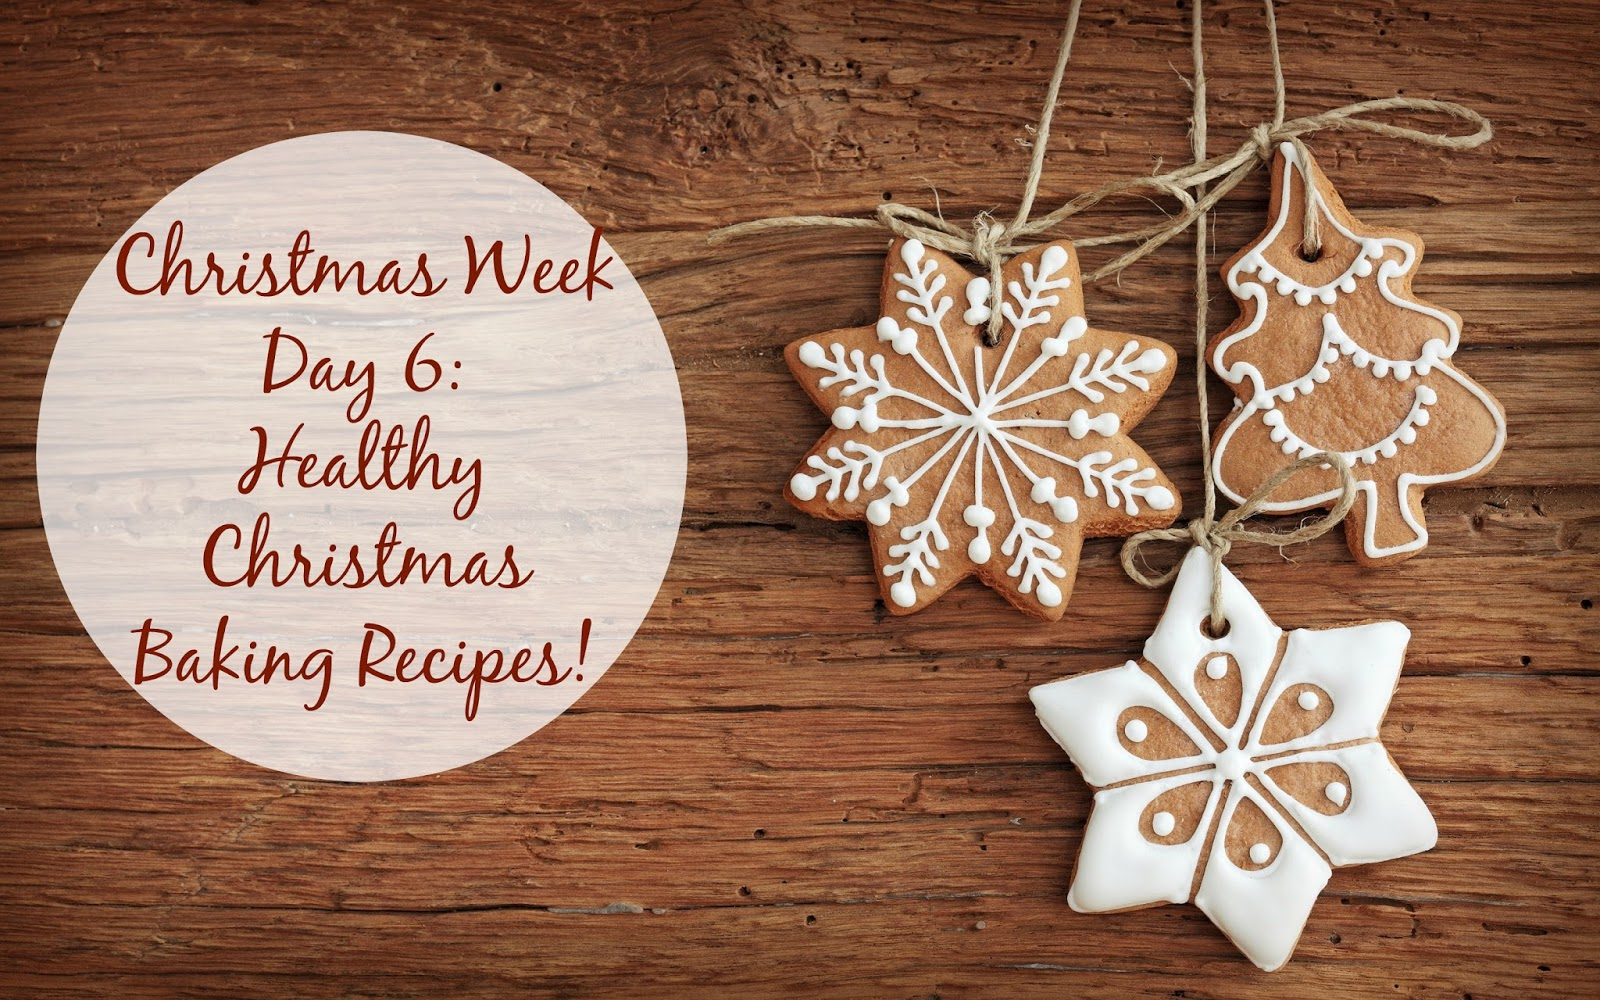 Christmas Week Day 6: Healthy Christmas Baking Recipes!